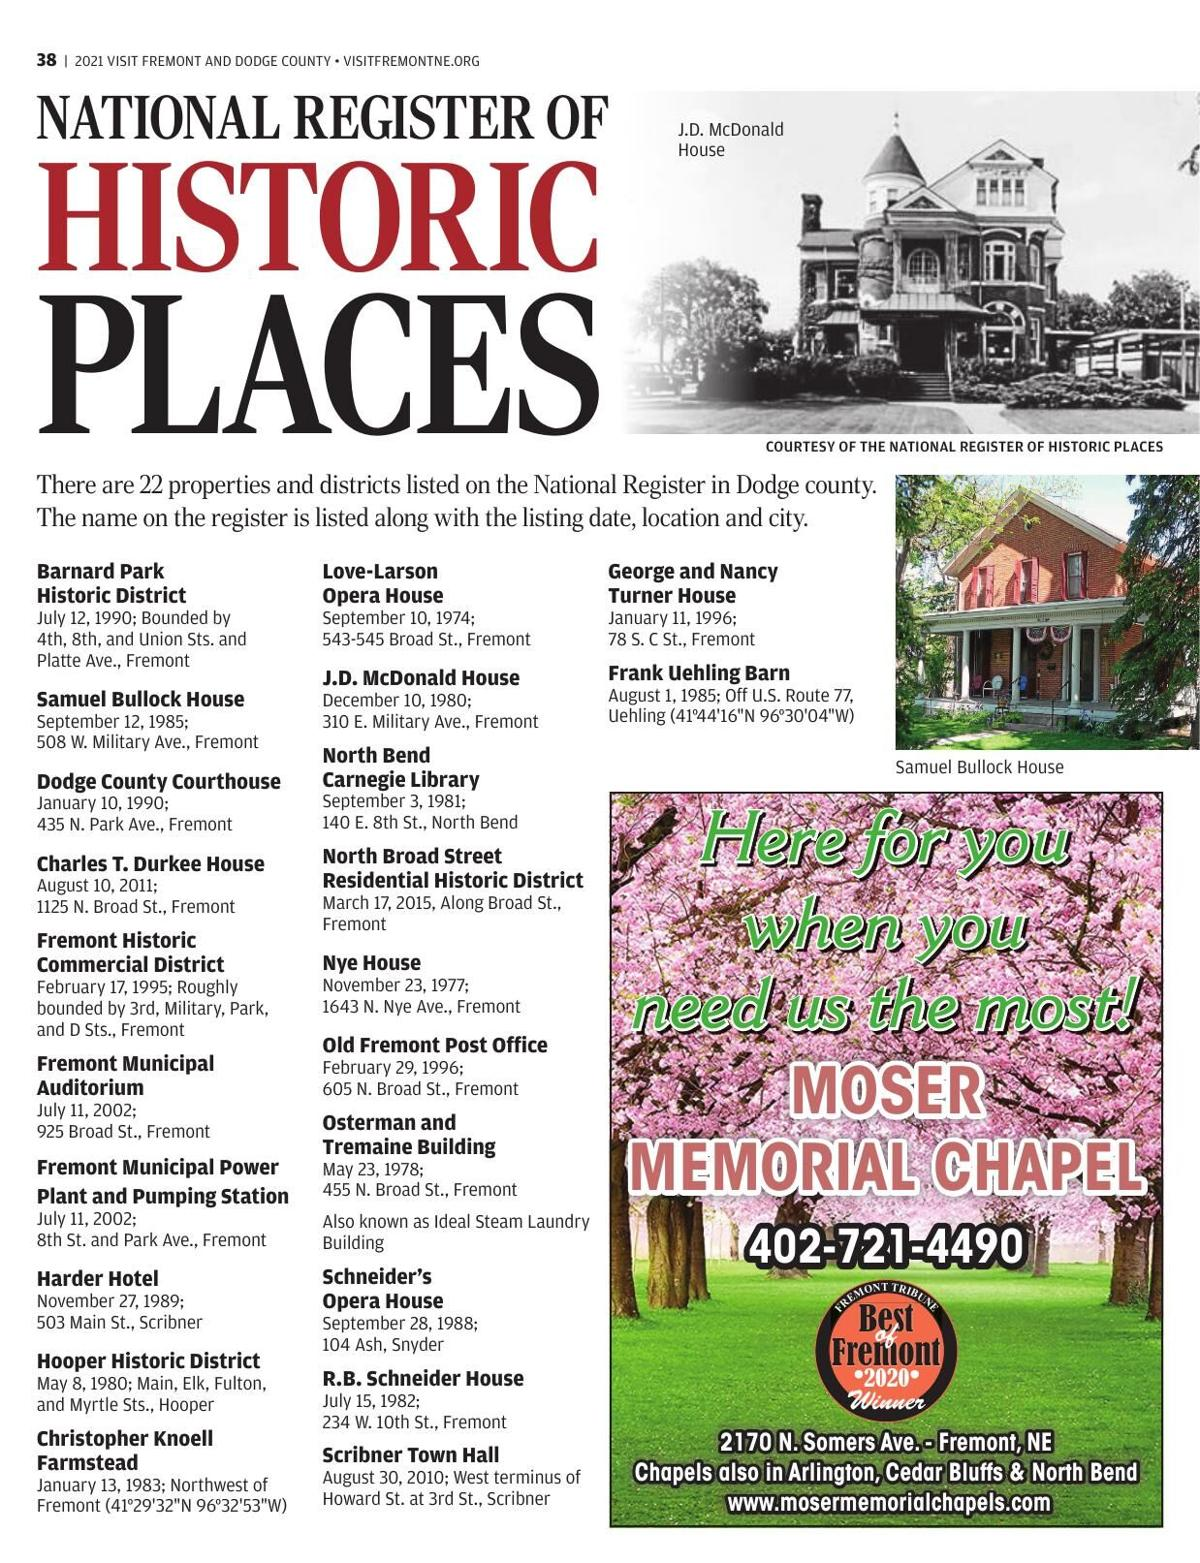 Visit Fremont and Dodge County 2021 38.pdf